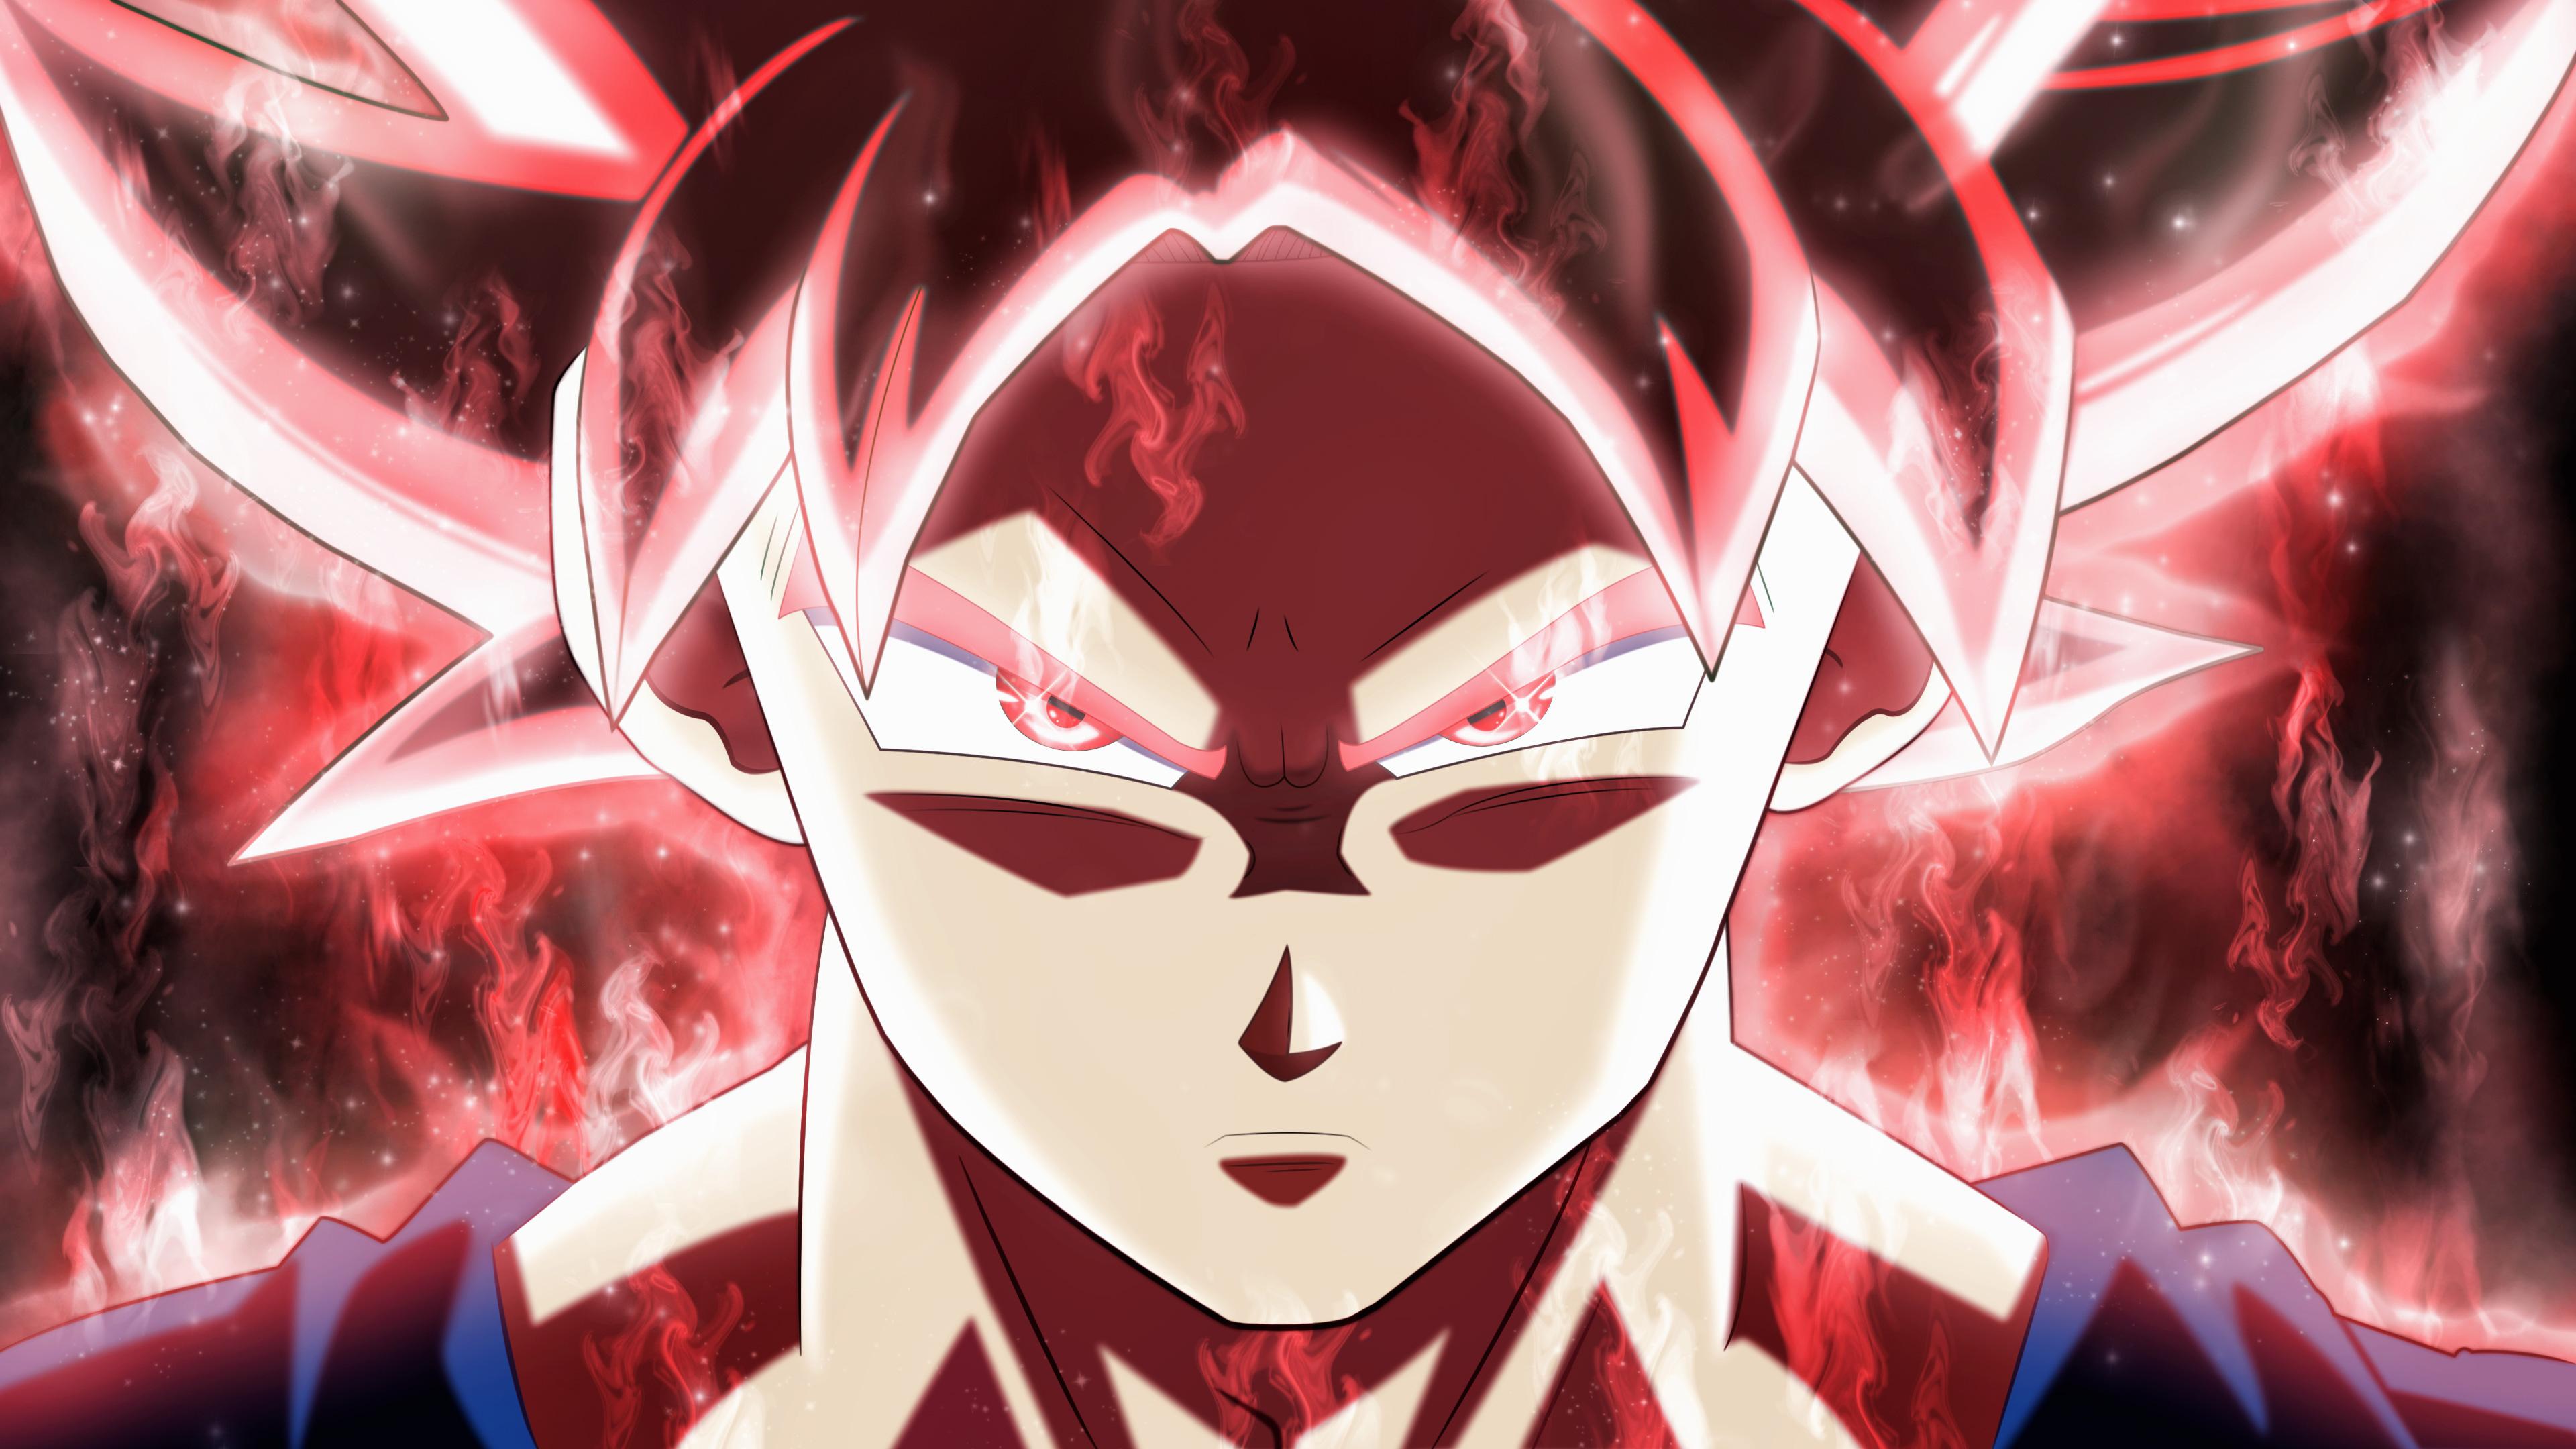 4k son goku dragon ball super hd games 4k wallpapers - Anime phone wallpaper 4k ...